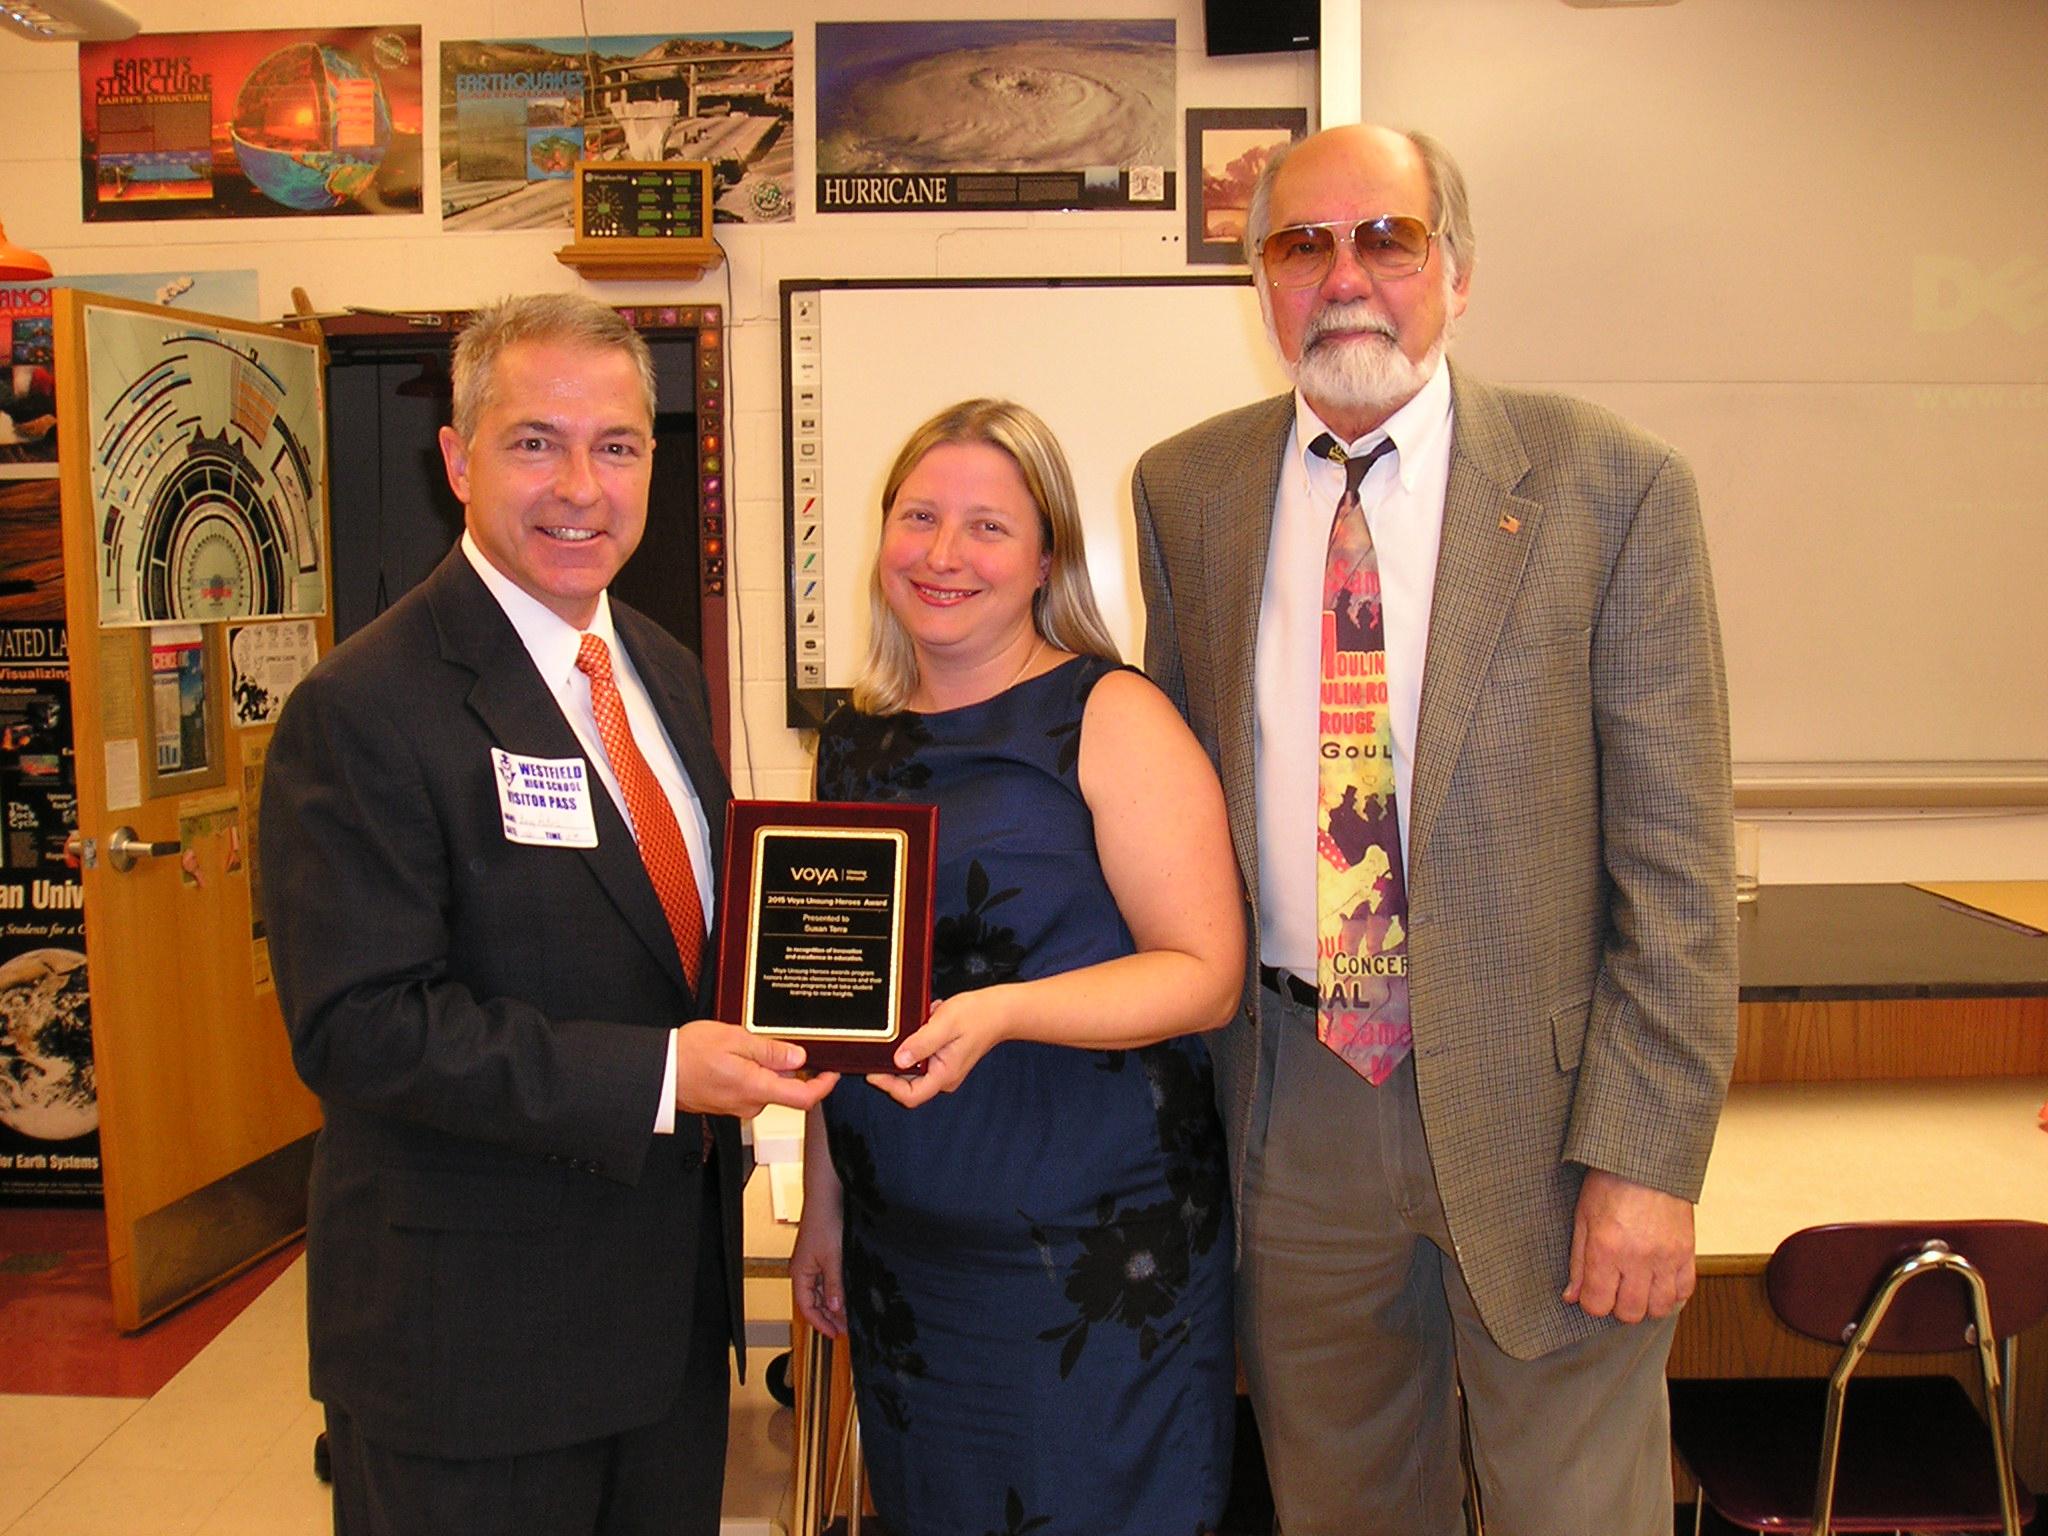 91dd5107c87ed972f310_29a2600e85ceabca5aa3_Susan_Marie_Terra_receives_Voya_Unsung_Heroes_Award.JPG